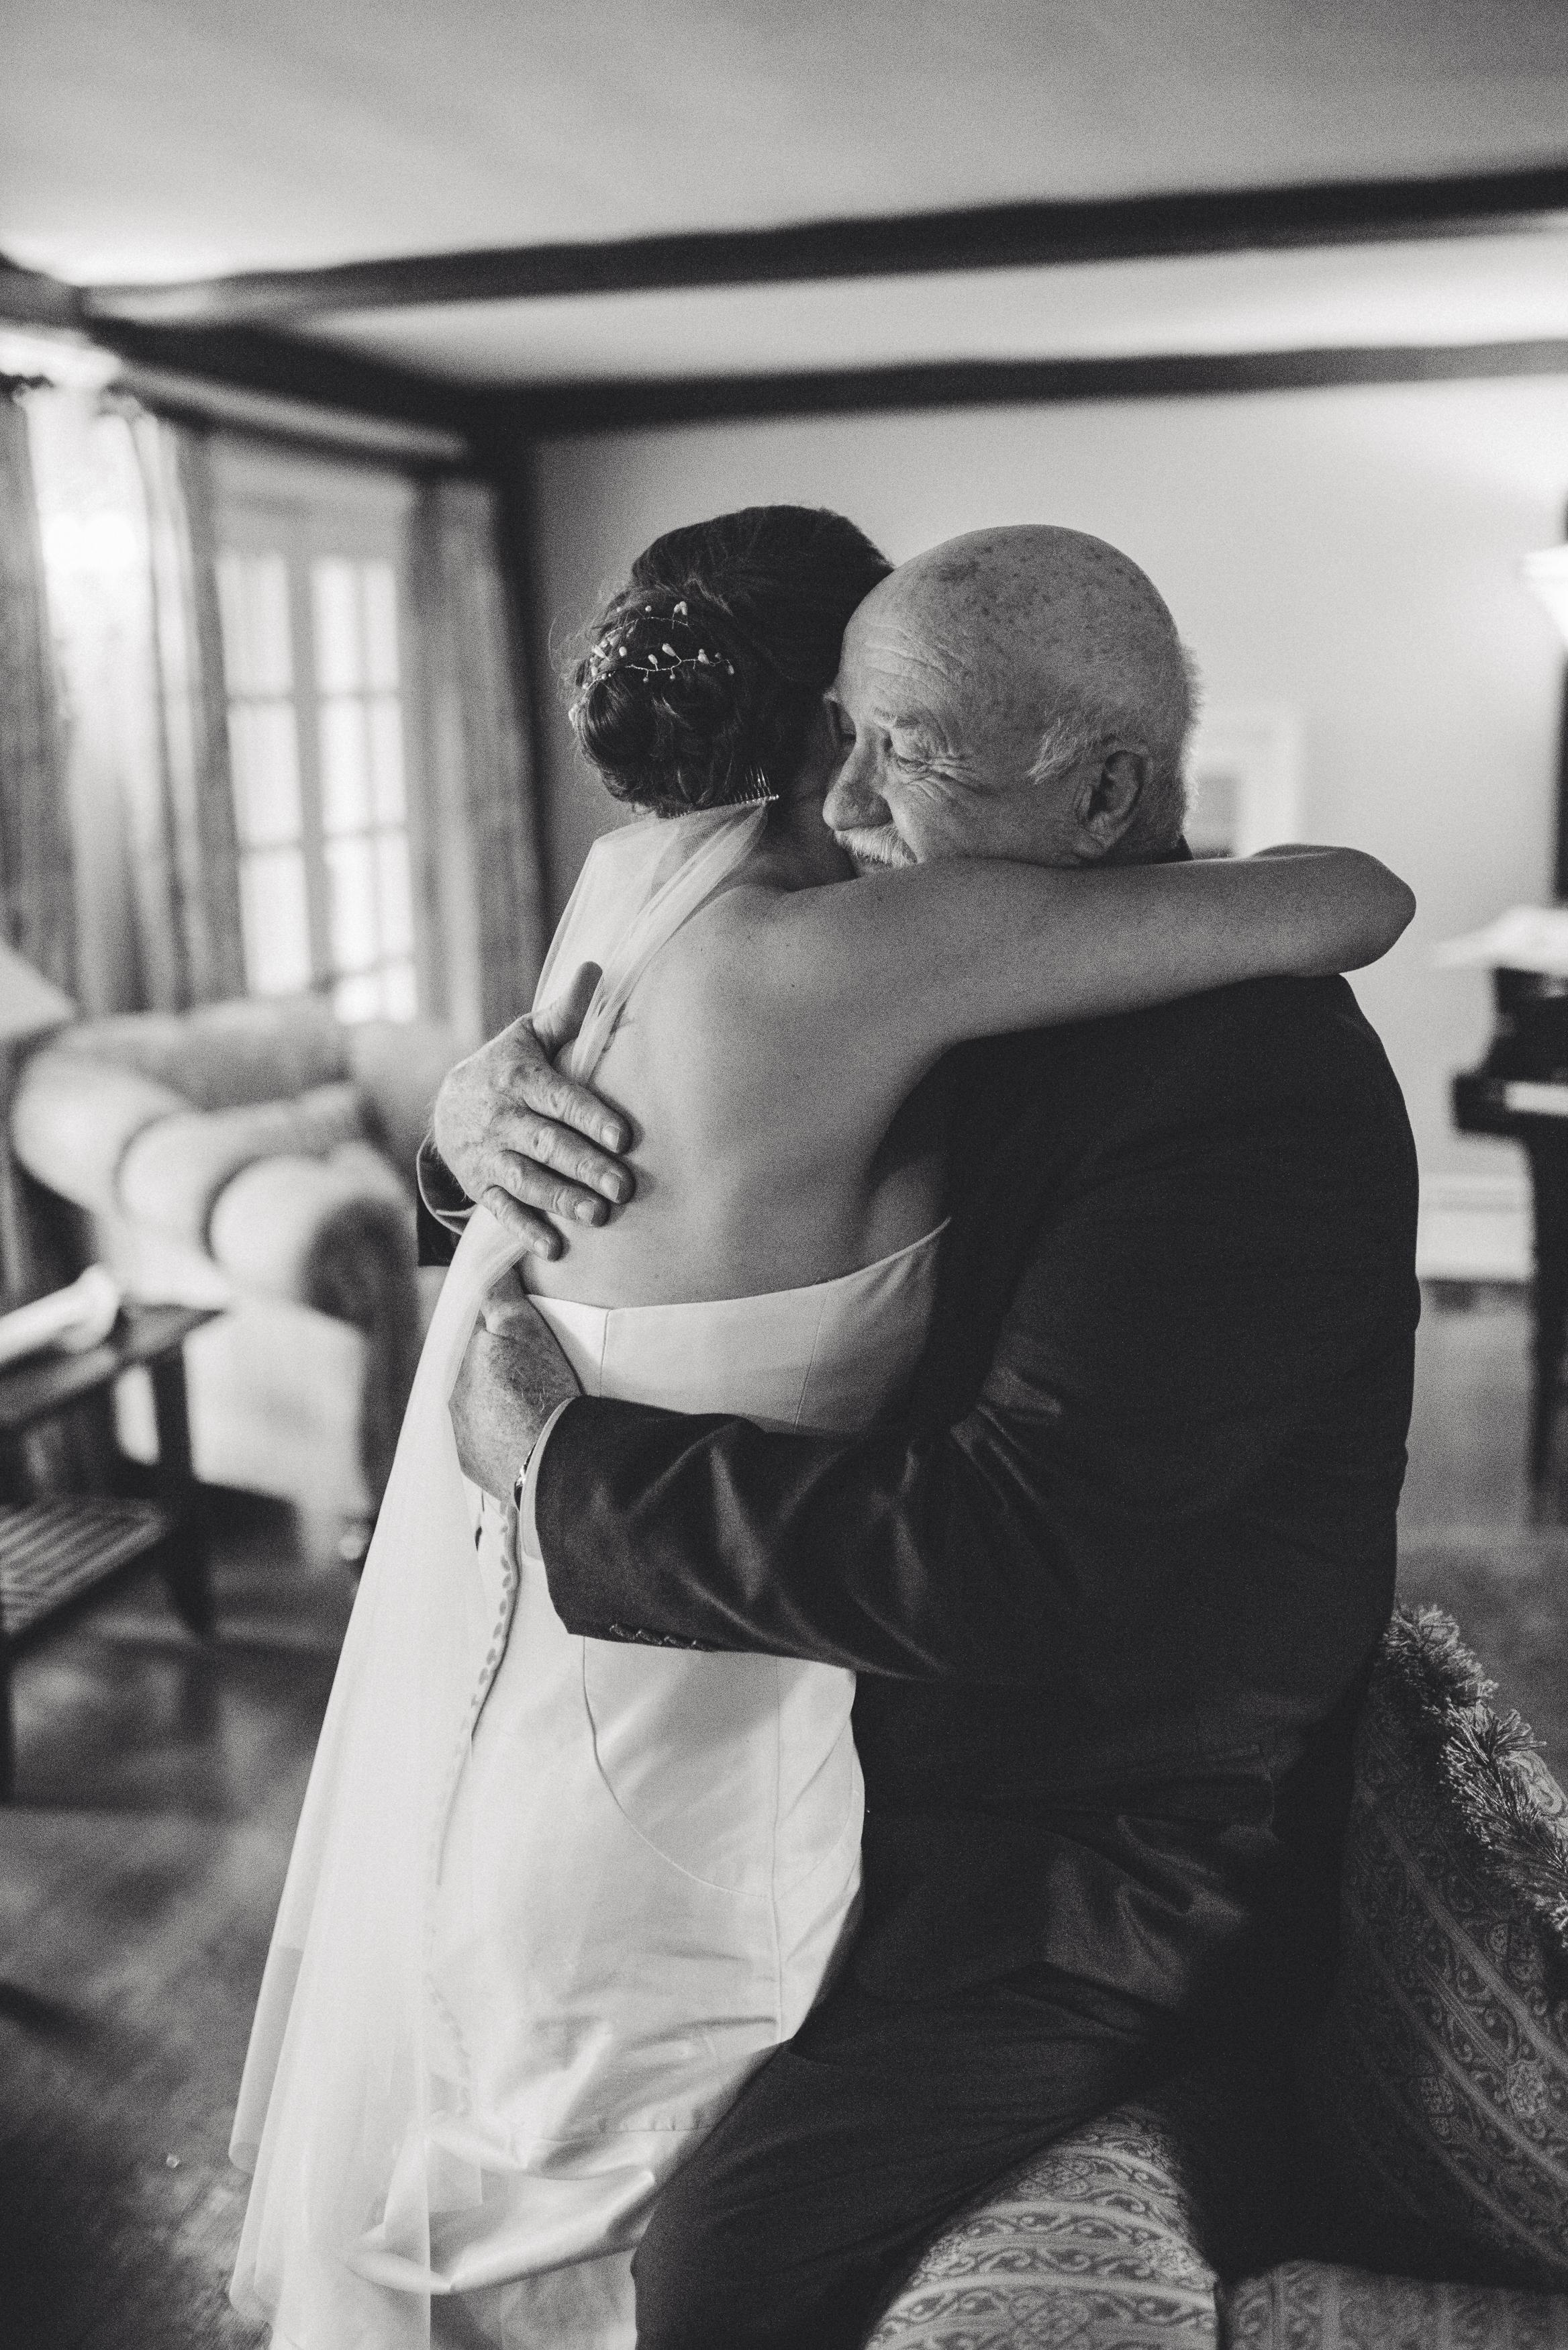 JACQUELINE & ANDREW WARSHAWER -BROOKMILL FARM FALL WEDDING - INTIMATE WEDDING PHOTOGRAPHER - TWOTWENTY by CHI-CHI AGBIM-196.jpg